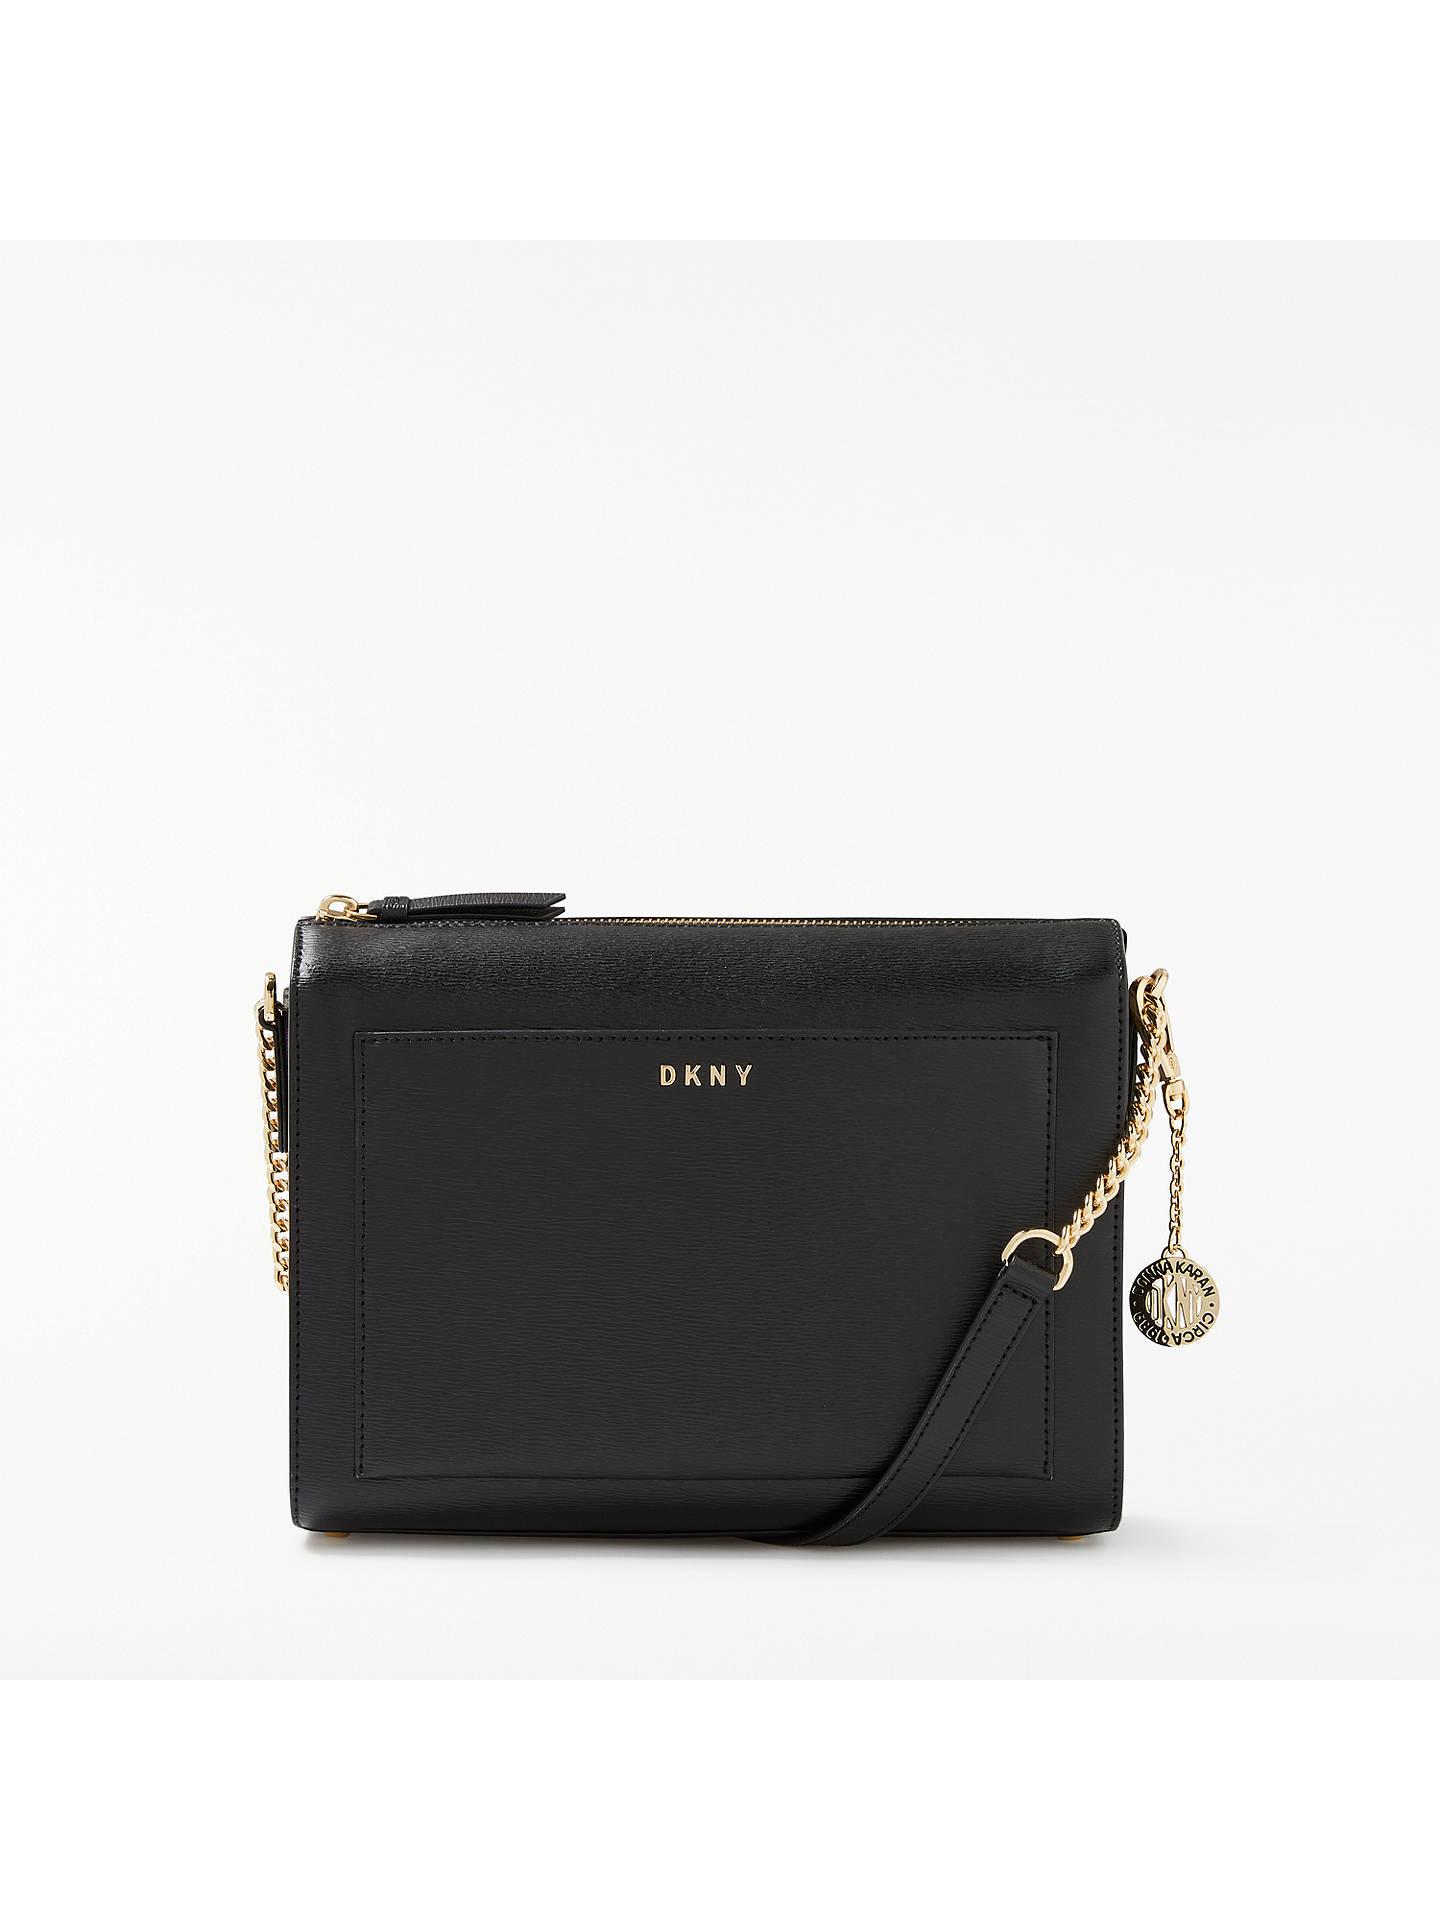 23ea058588c Buy DKNY Sutton Textured Leather Medium Cross Body Bag